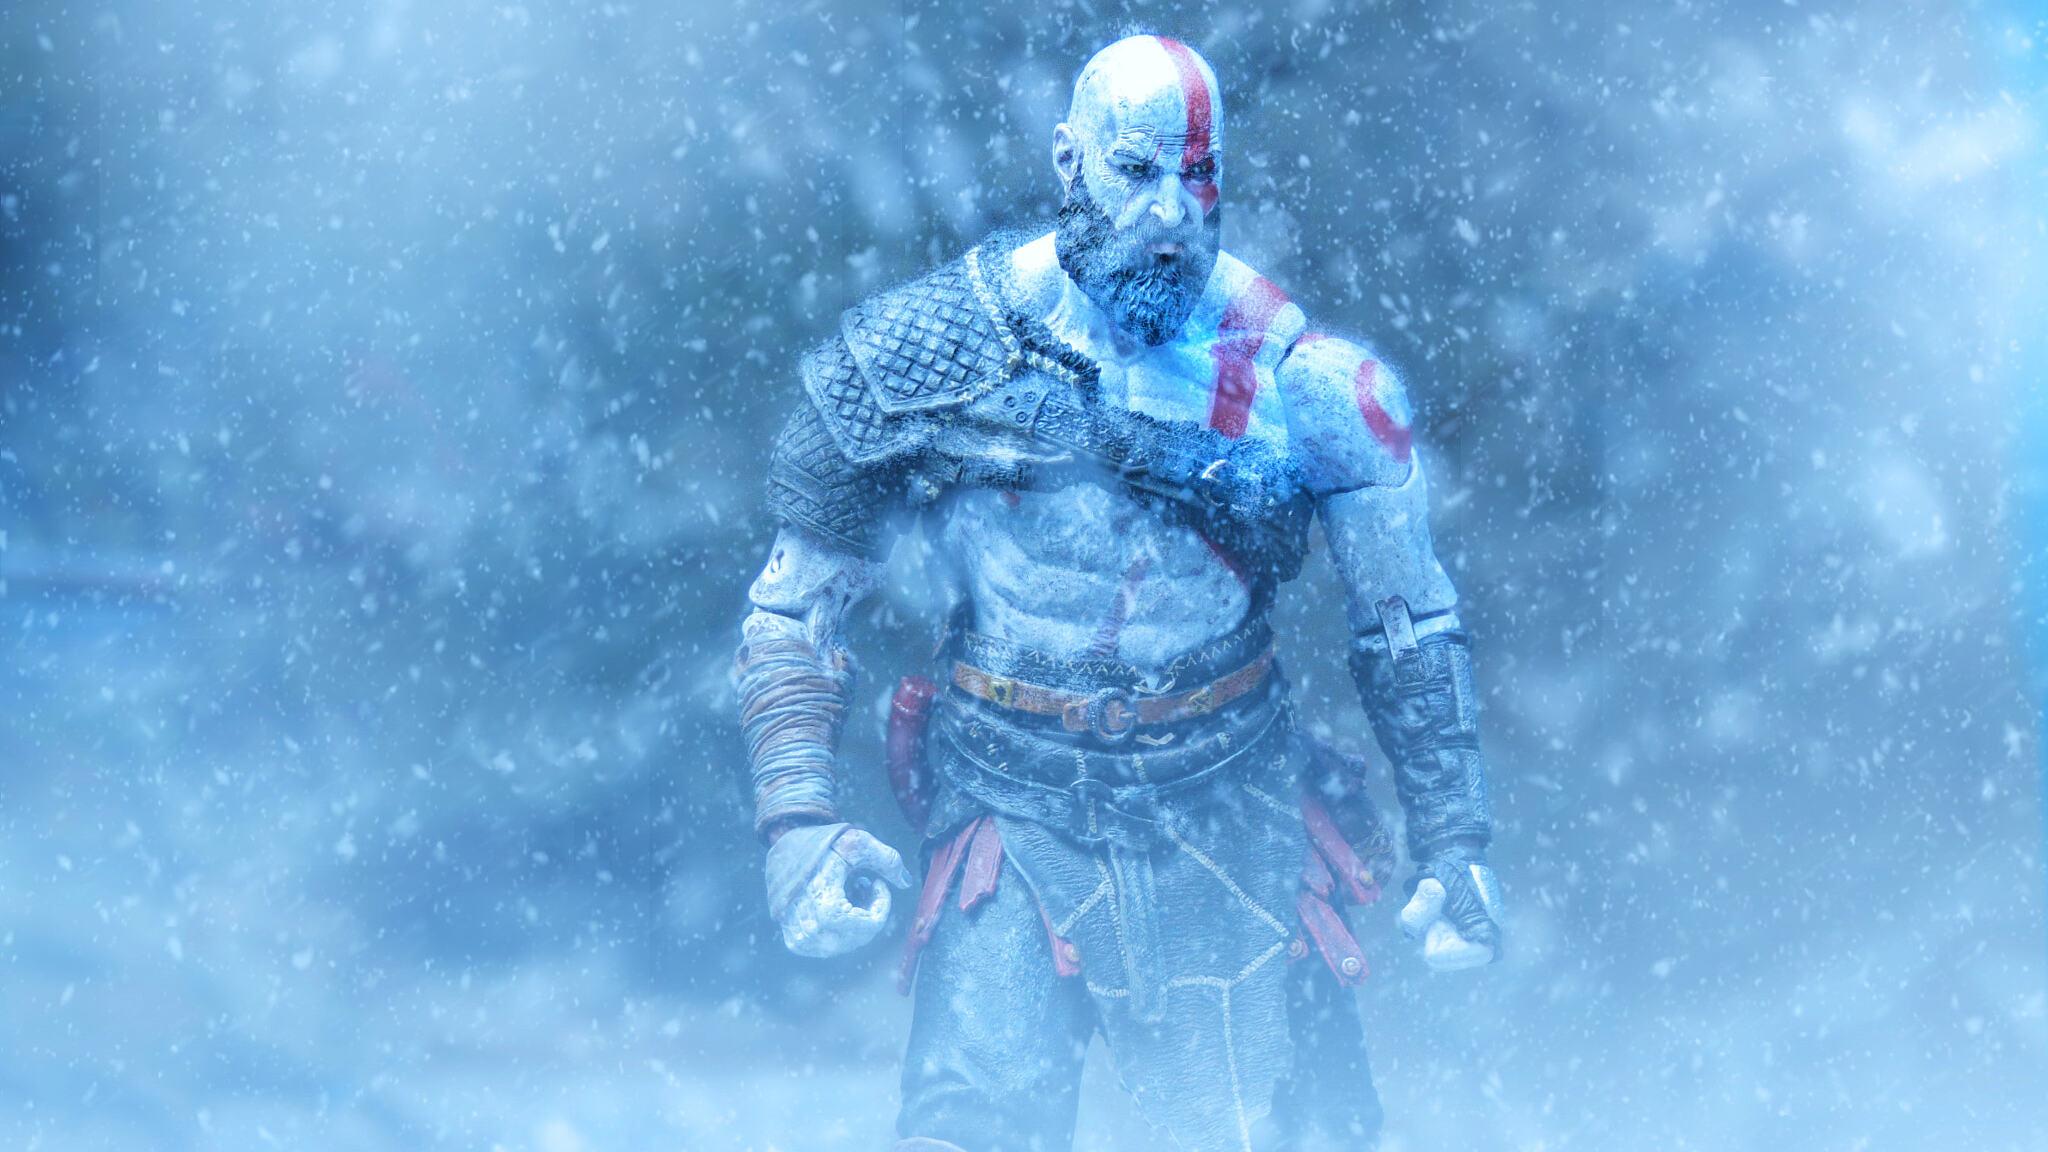 kratos-god-of-war-video-game-hd-ef.jpg